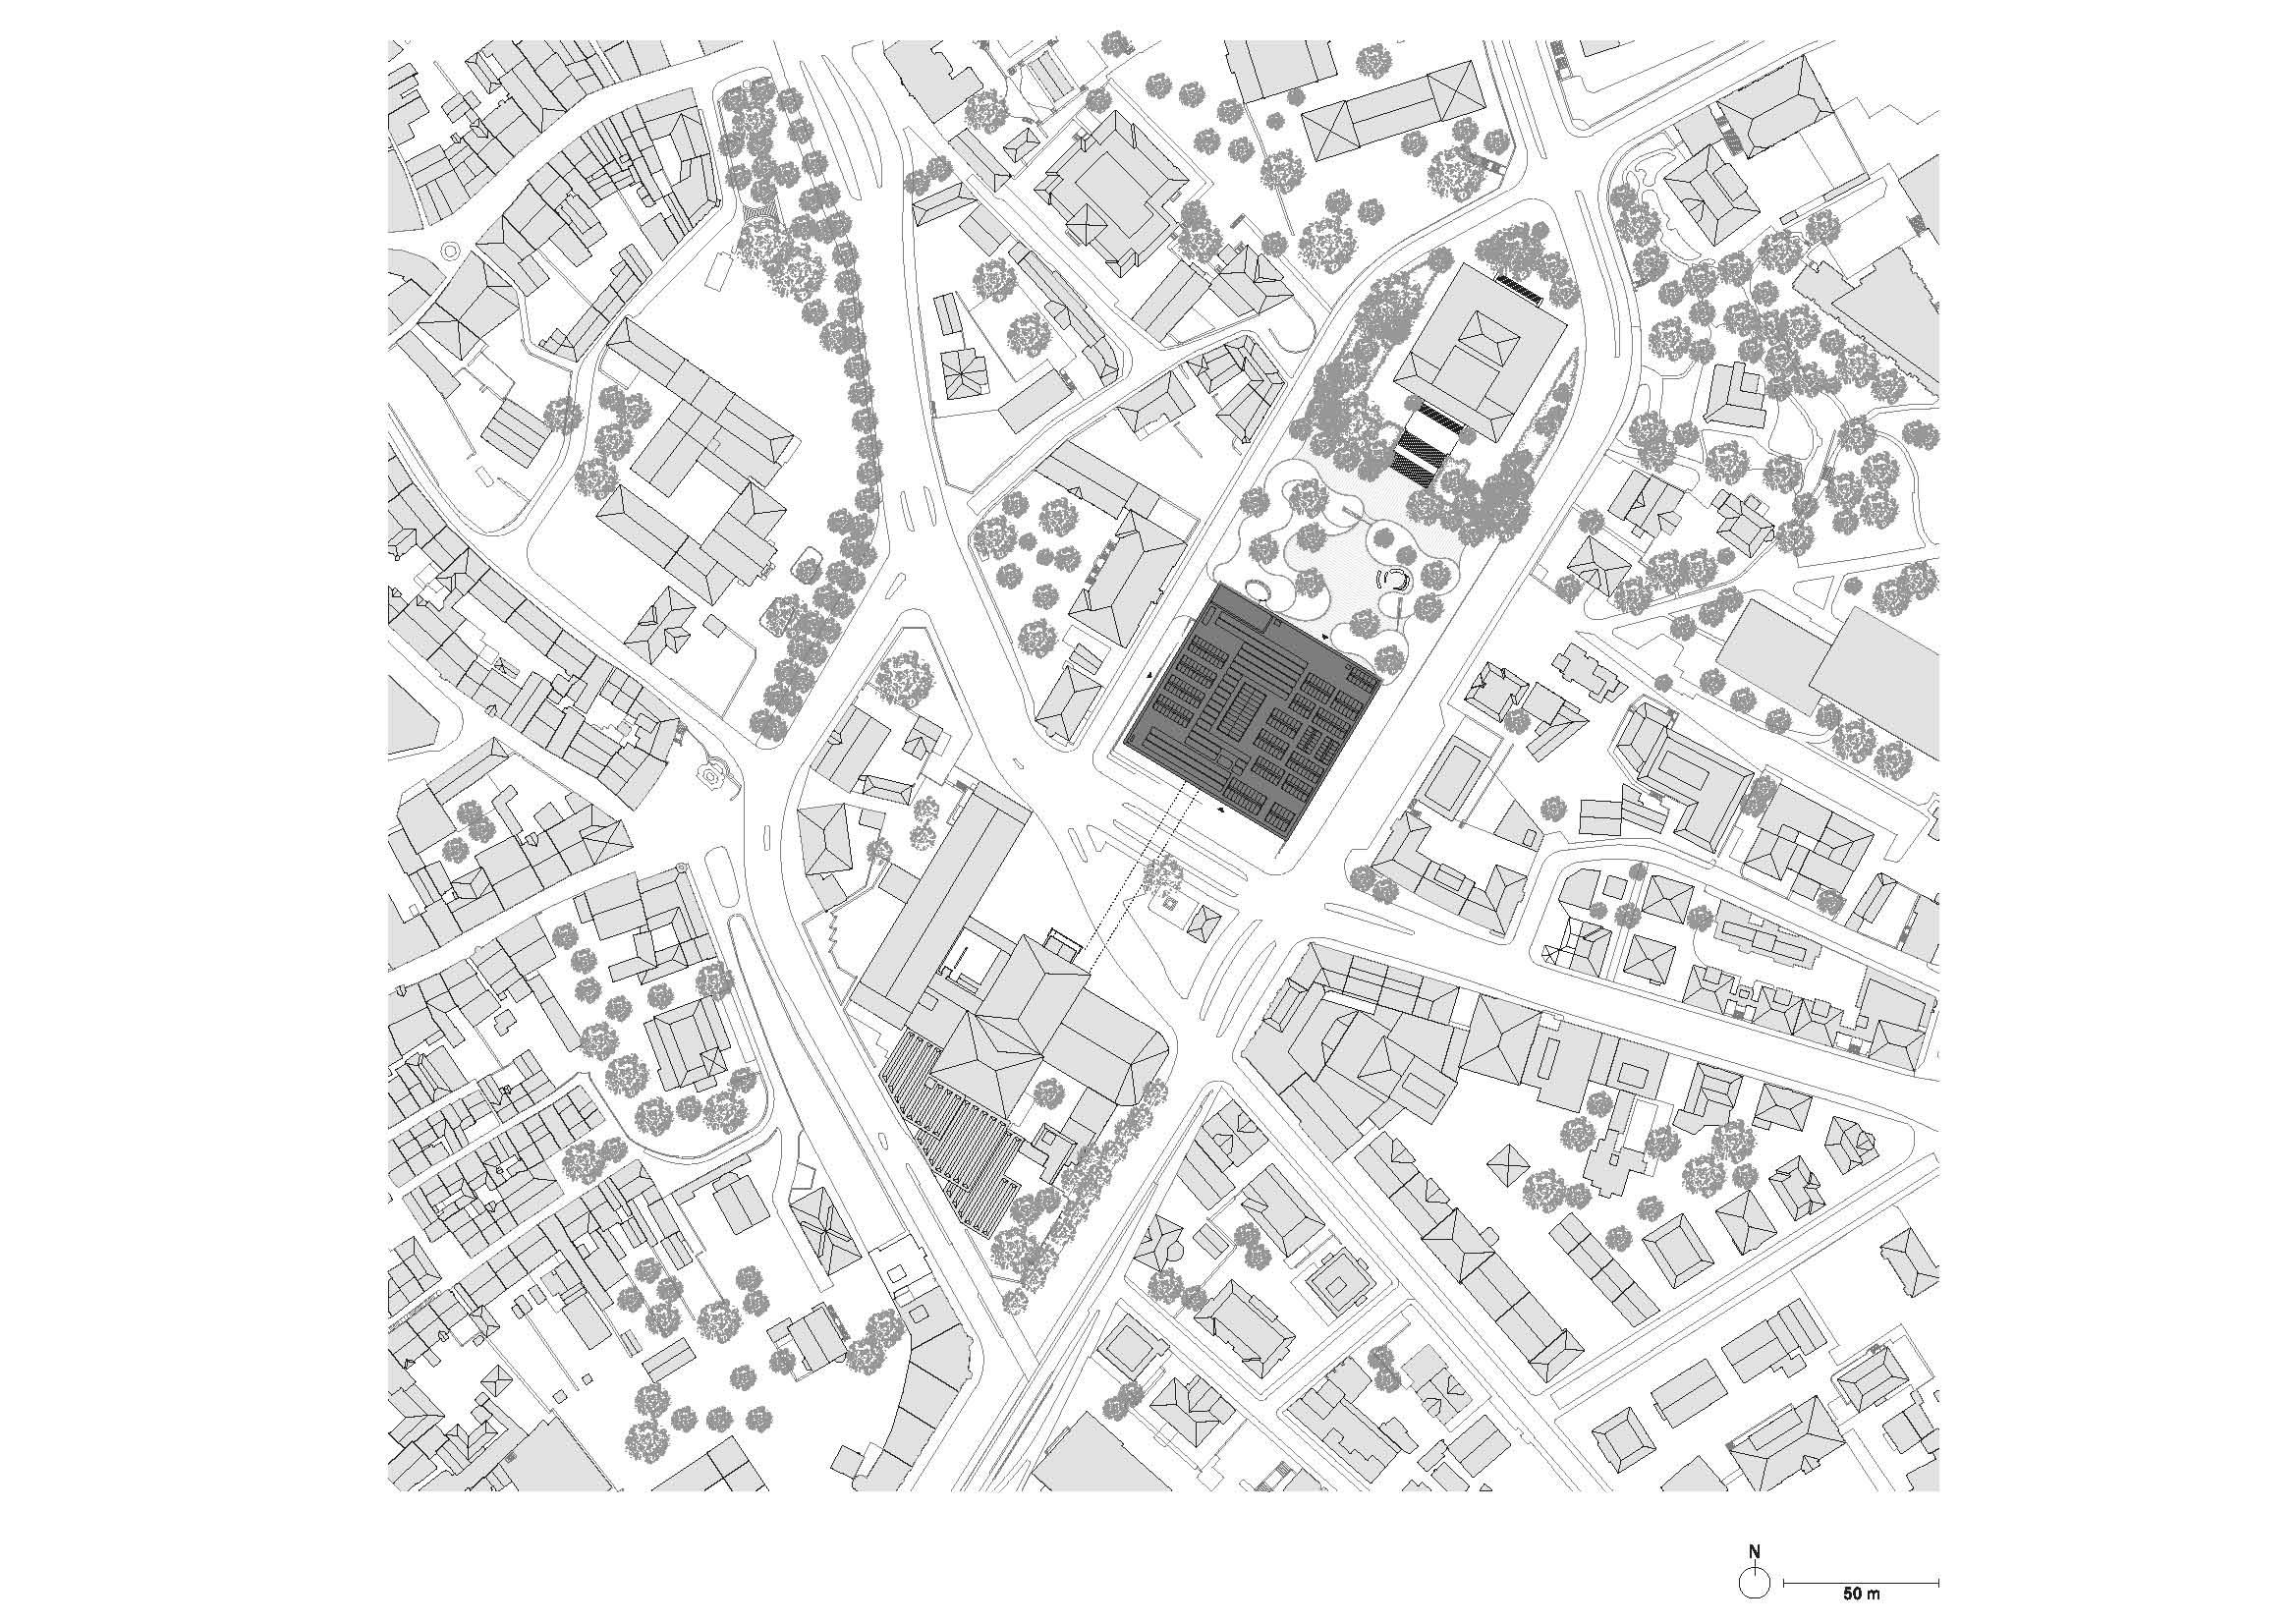 Kunsthaus Zürich  - 20210712 Chipperfield Kunsthaus 11 55